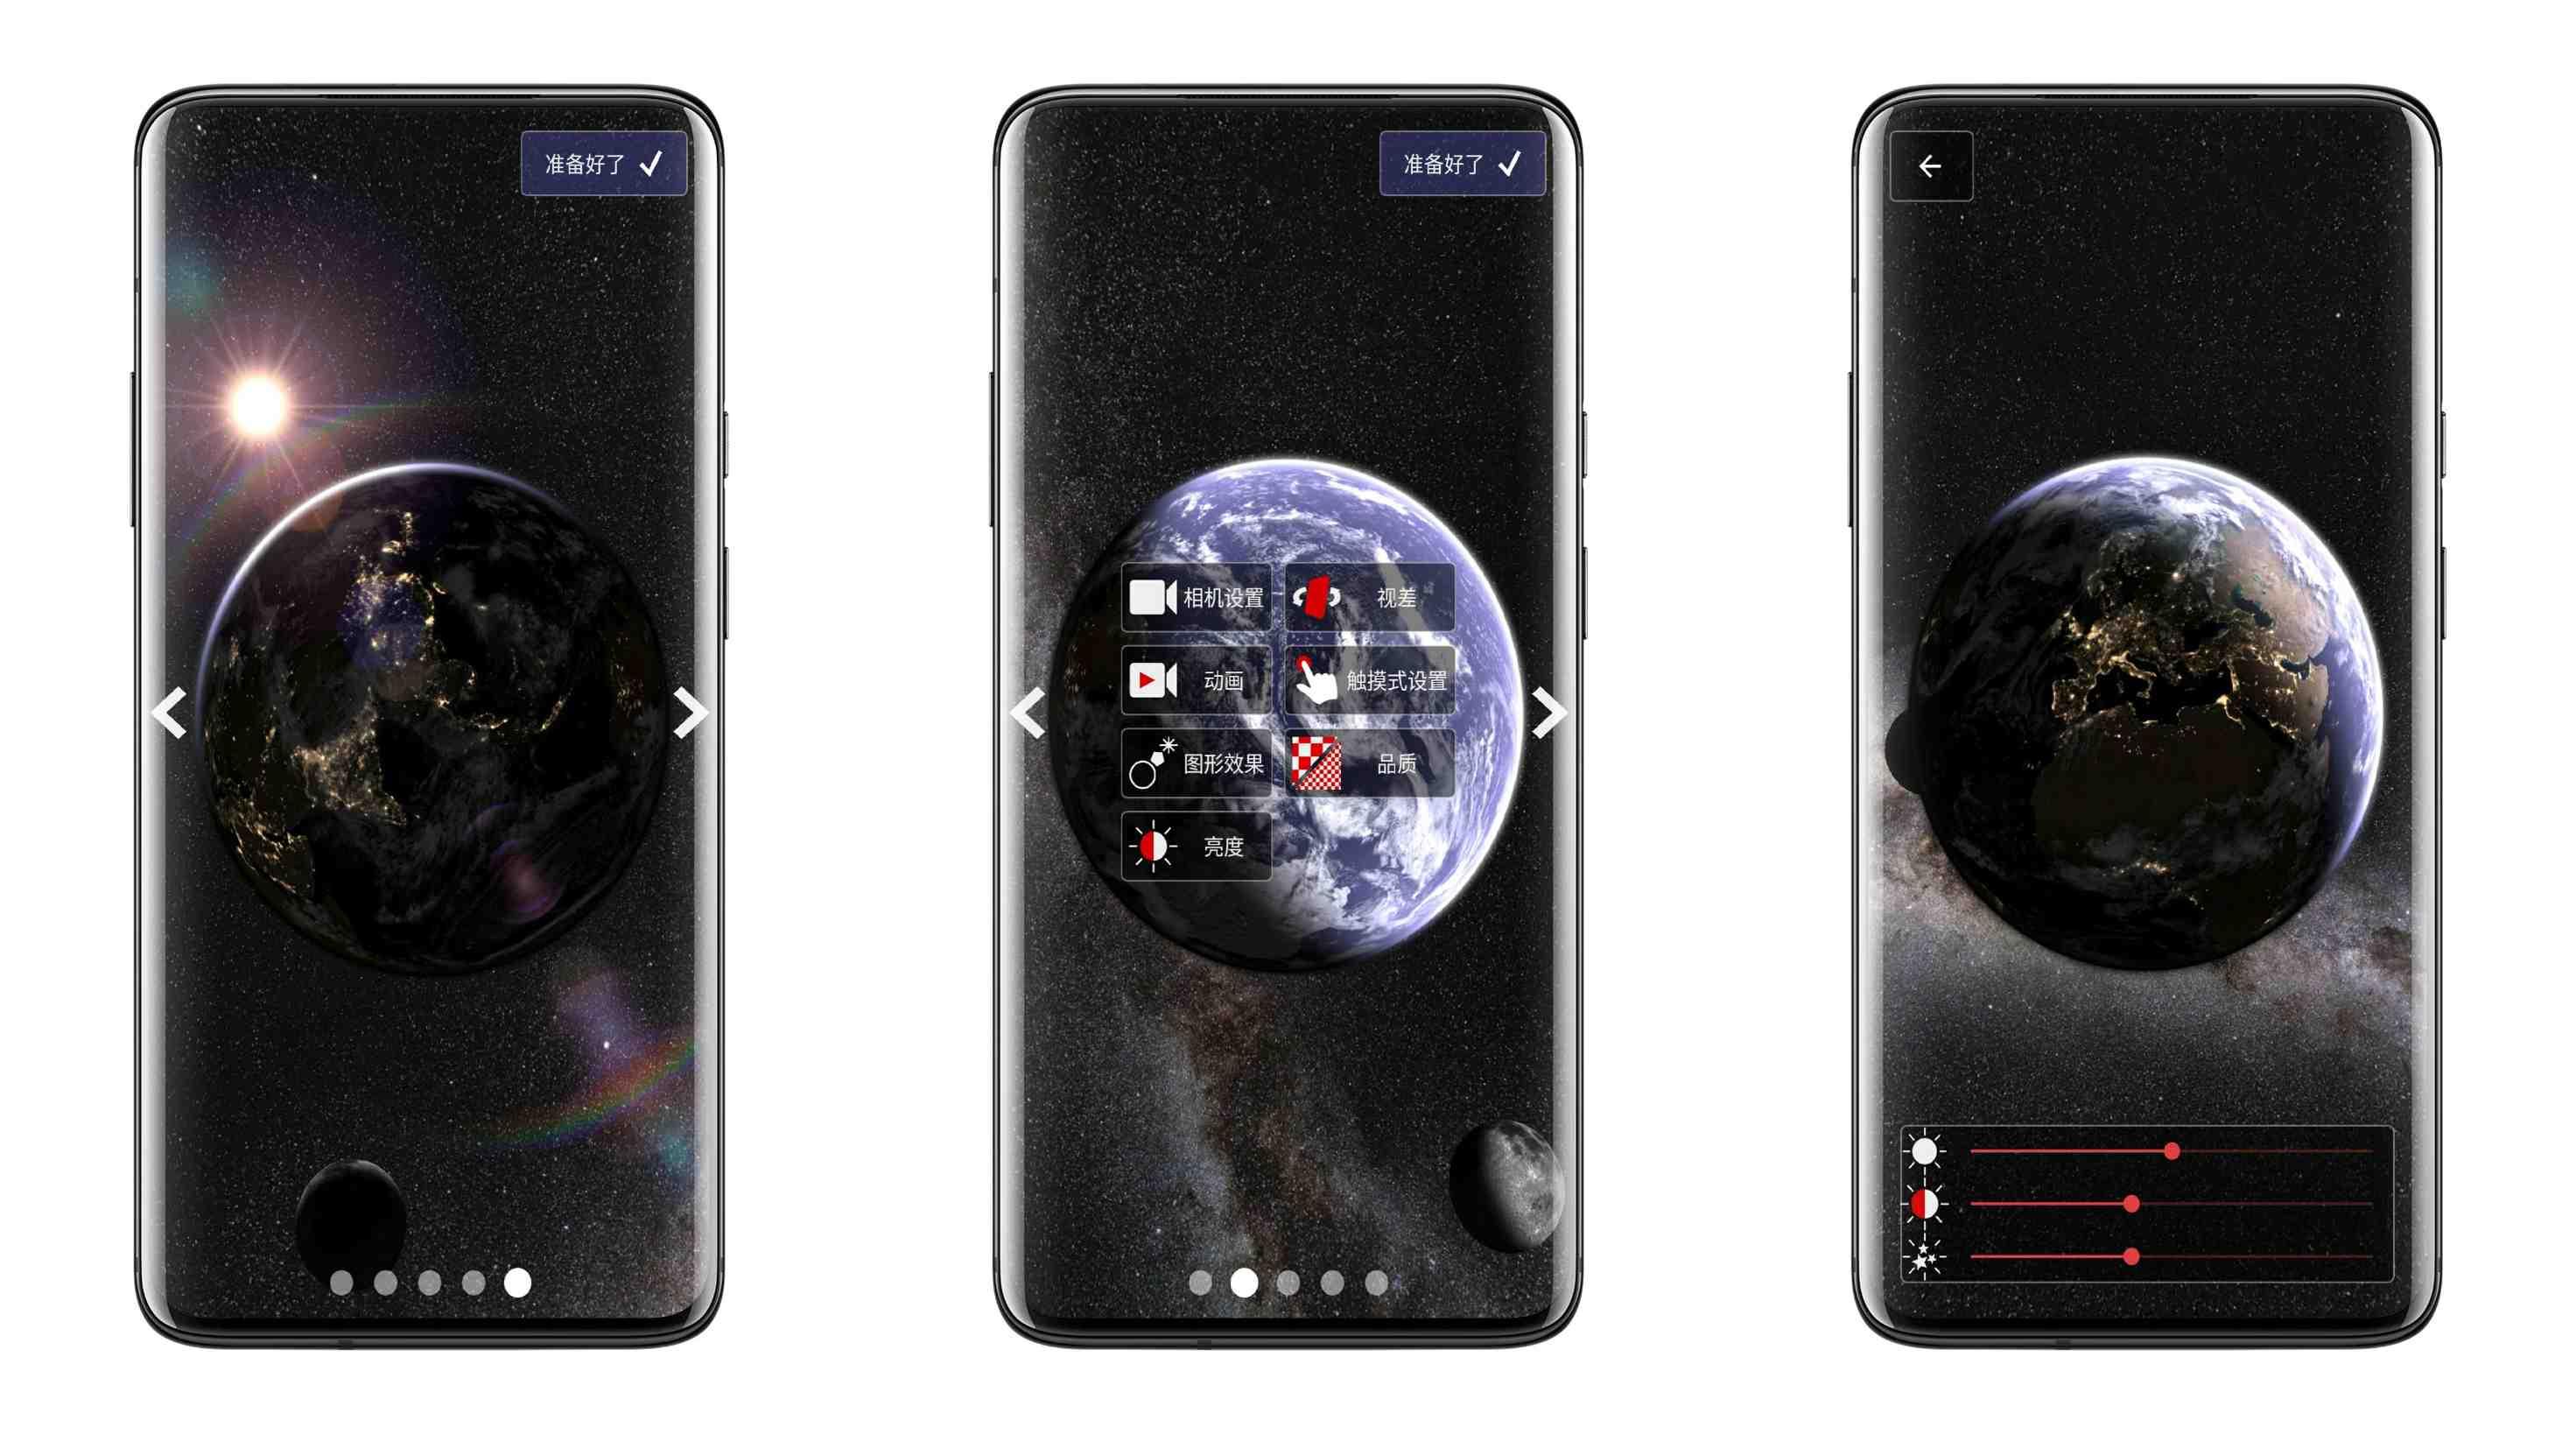 Earth Moon 最好的地球动态 v2.9解锁版